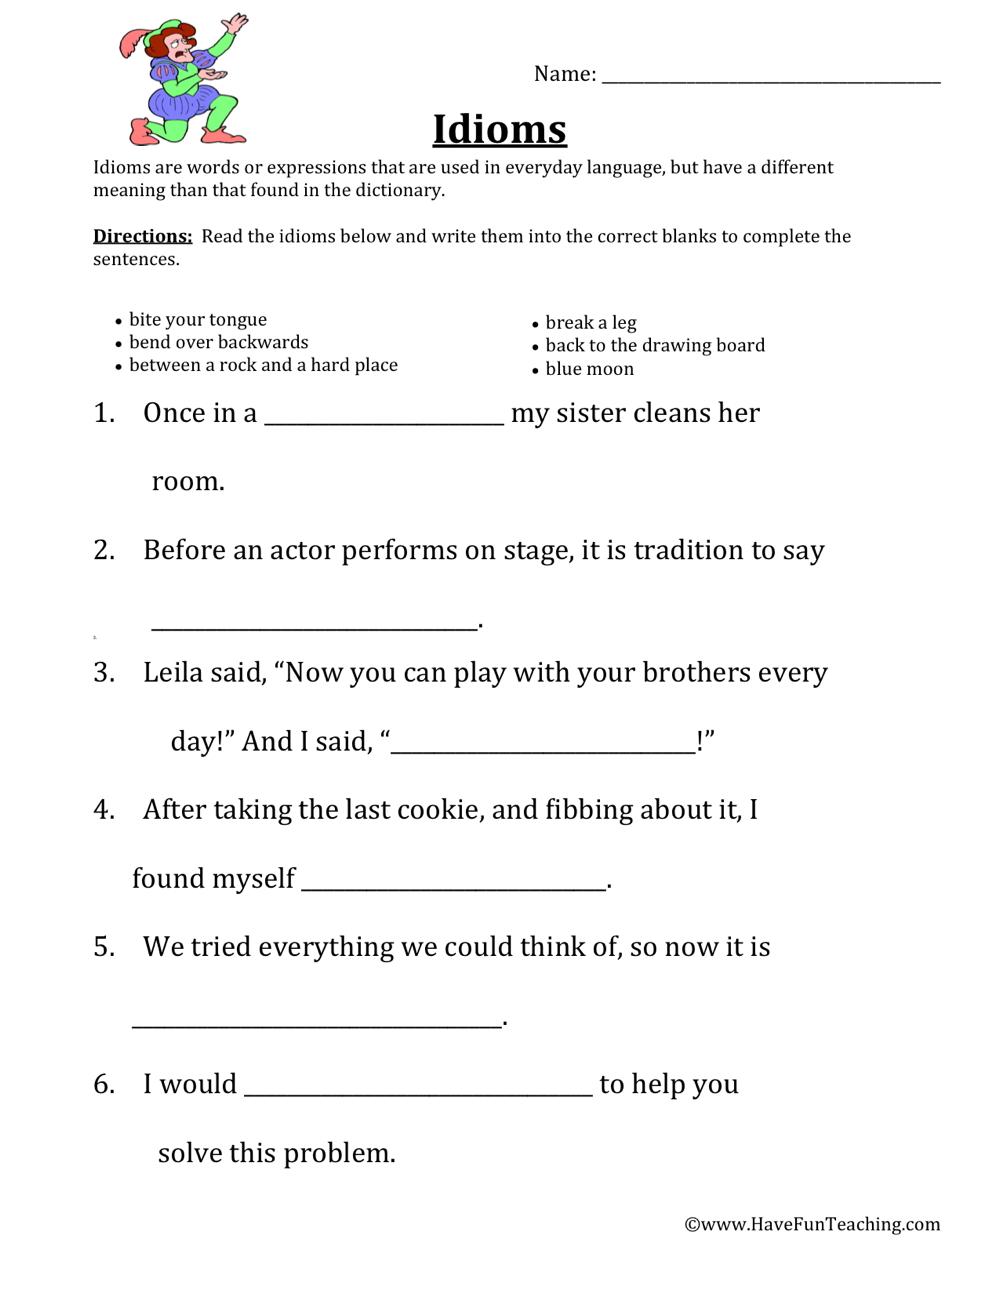 medium resolution of Defining Idioms Worksheet • Have Fun Teaching